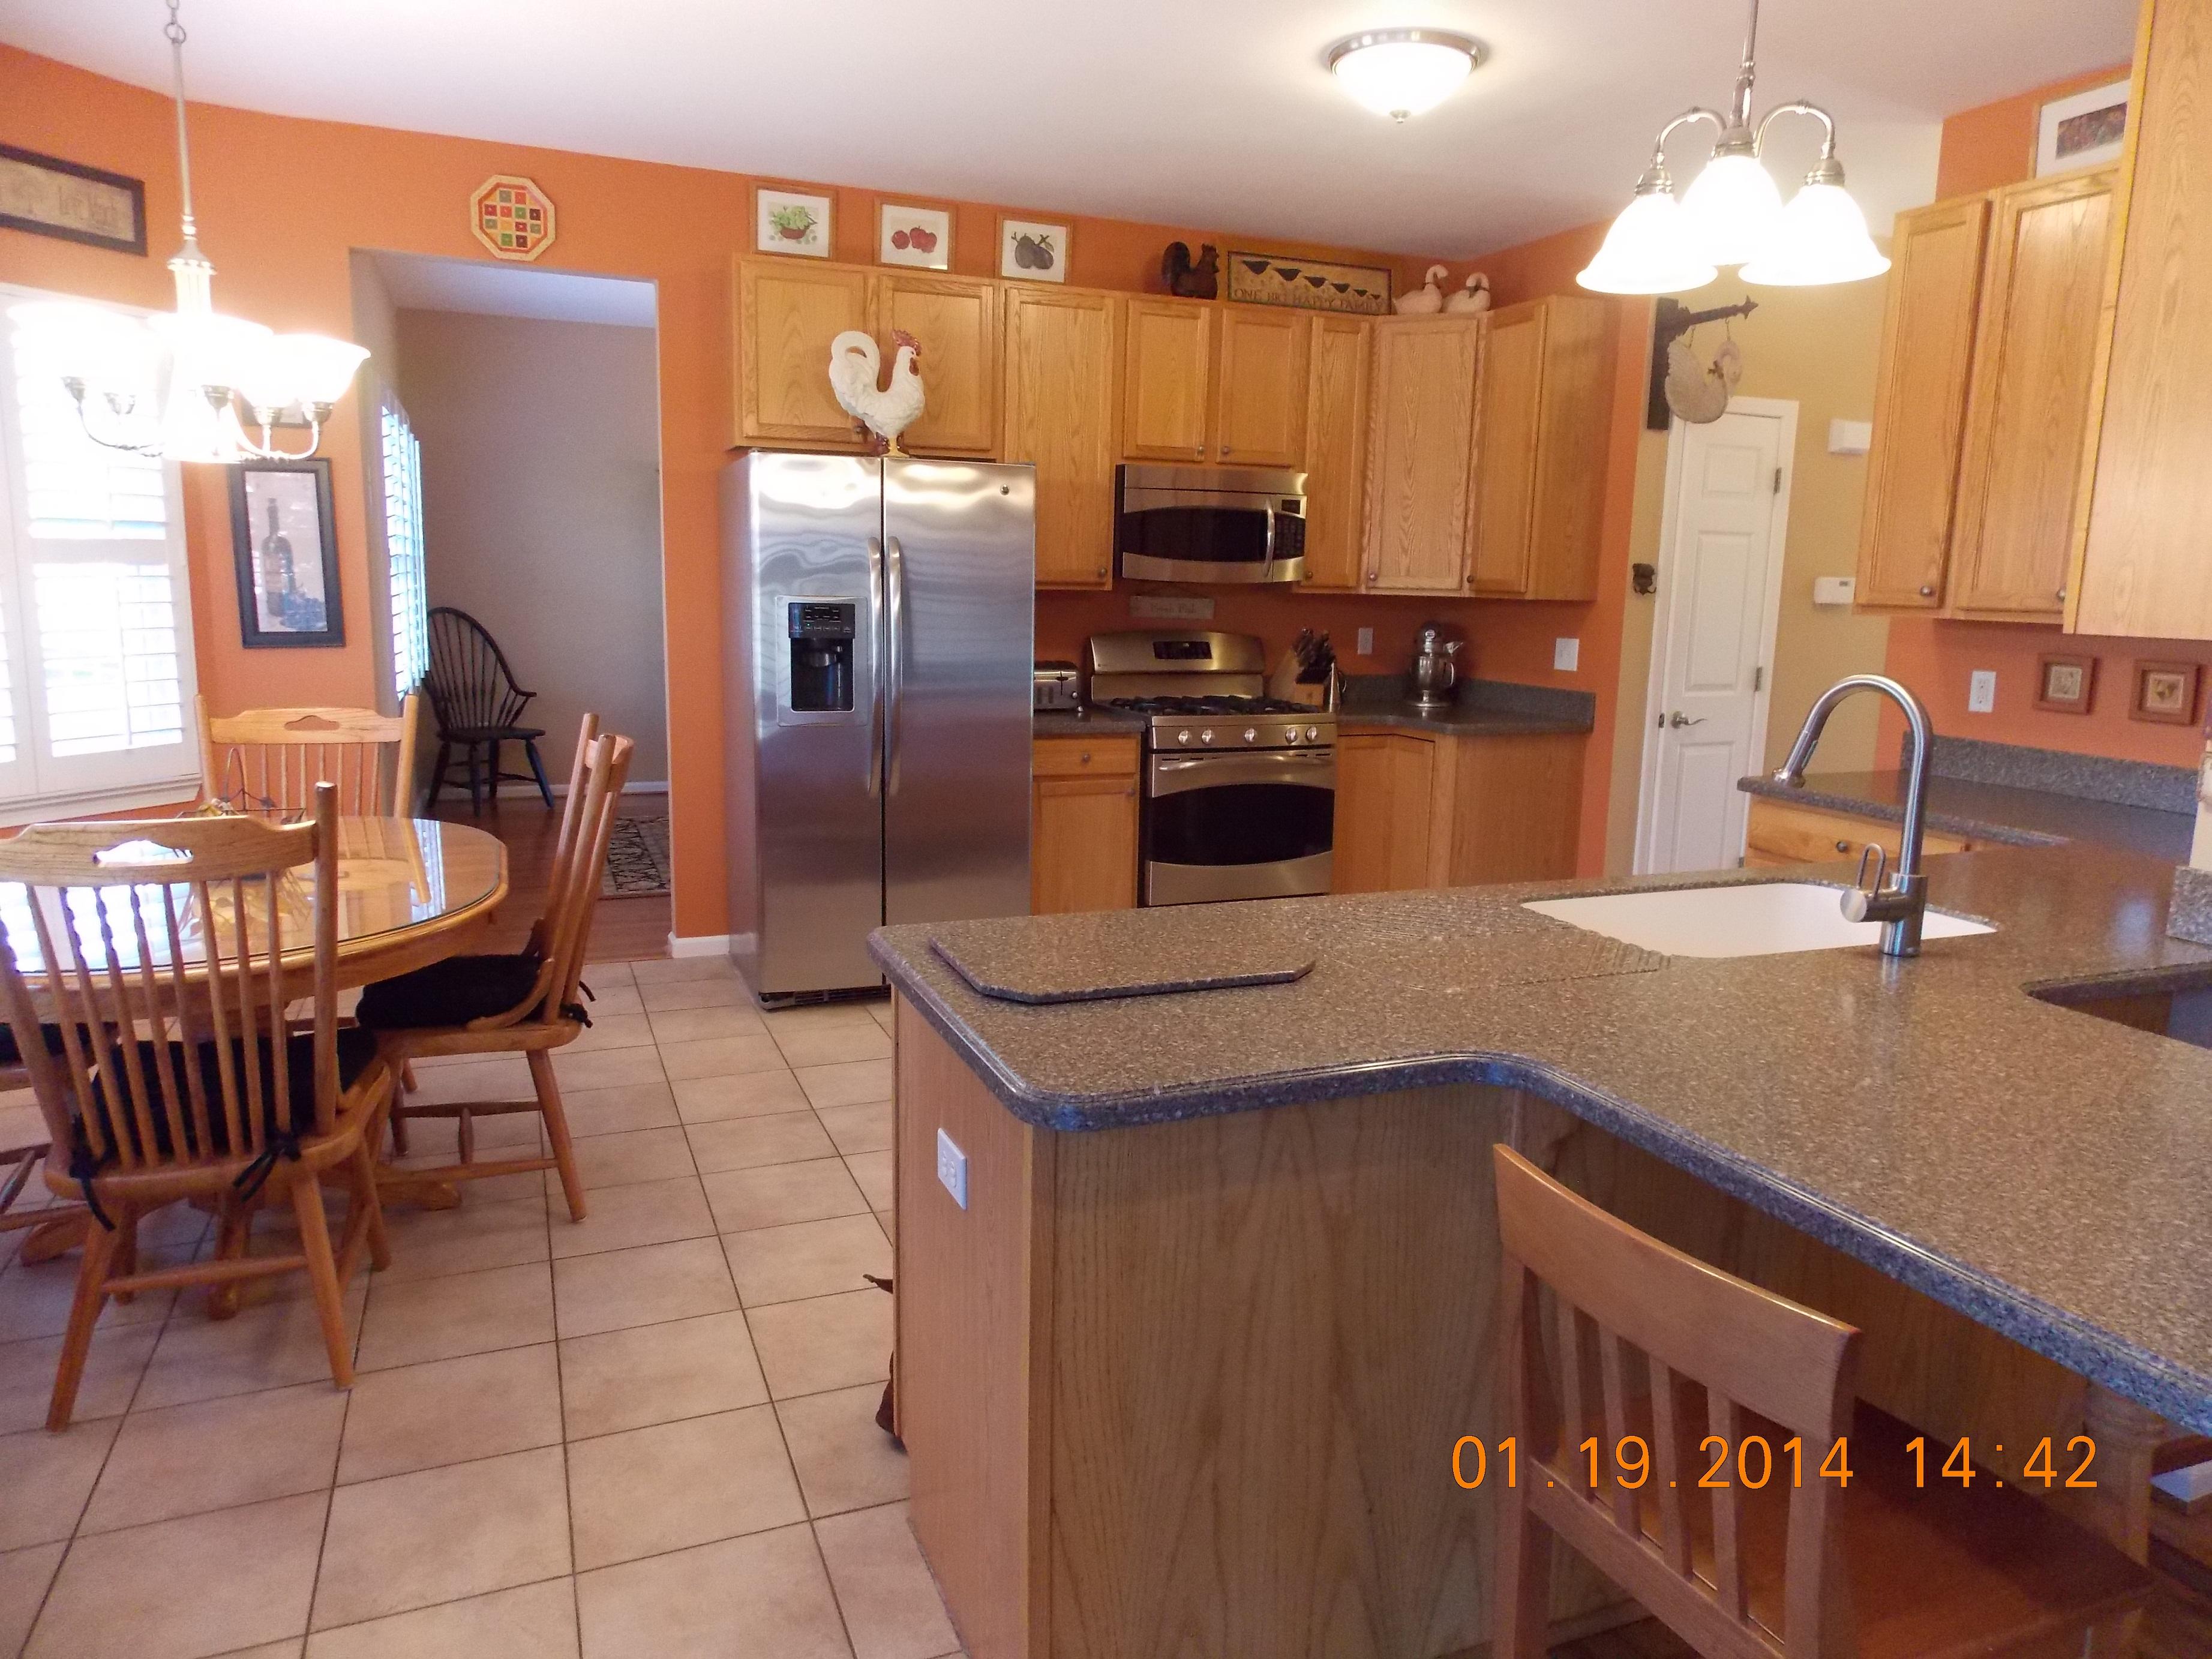 185 Club House Kitchen